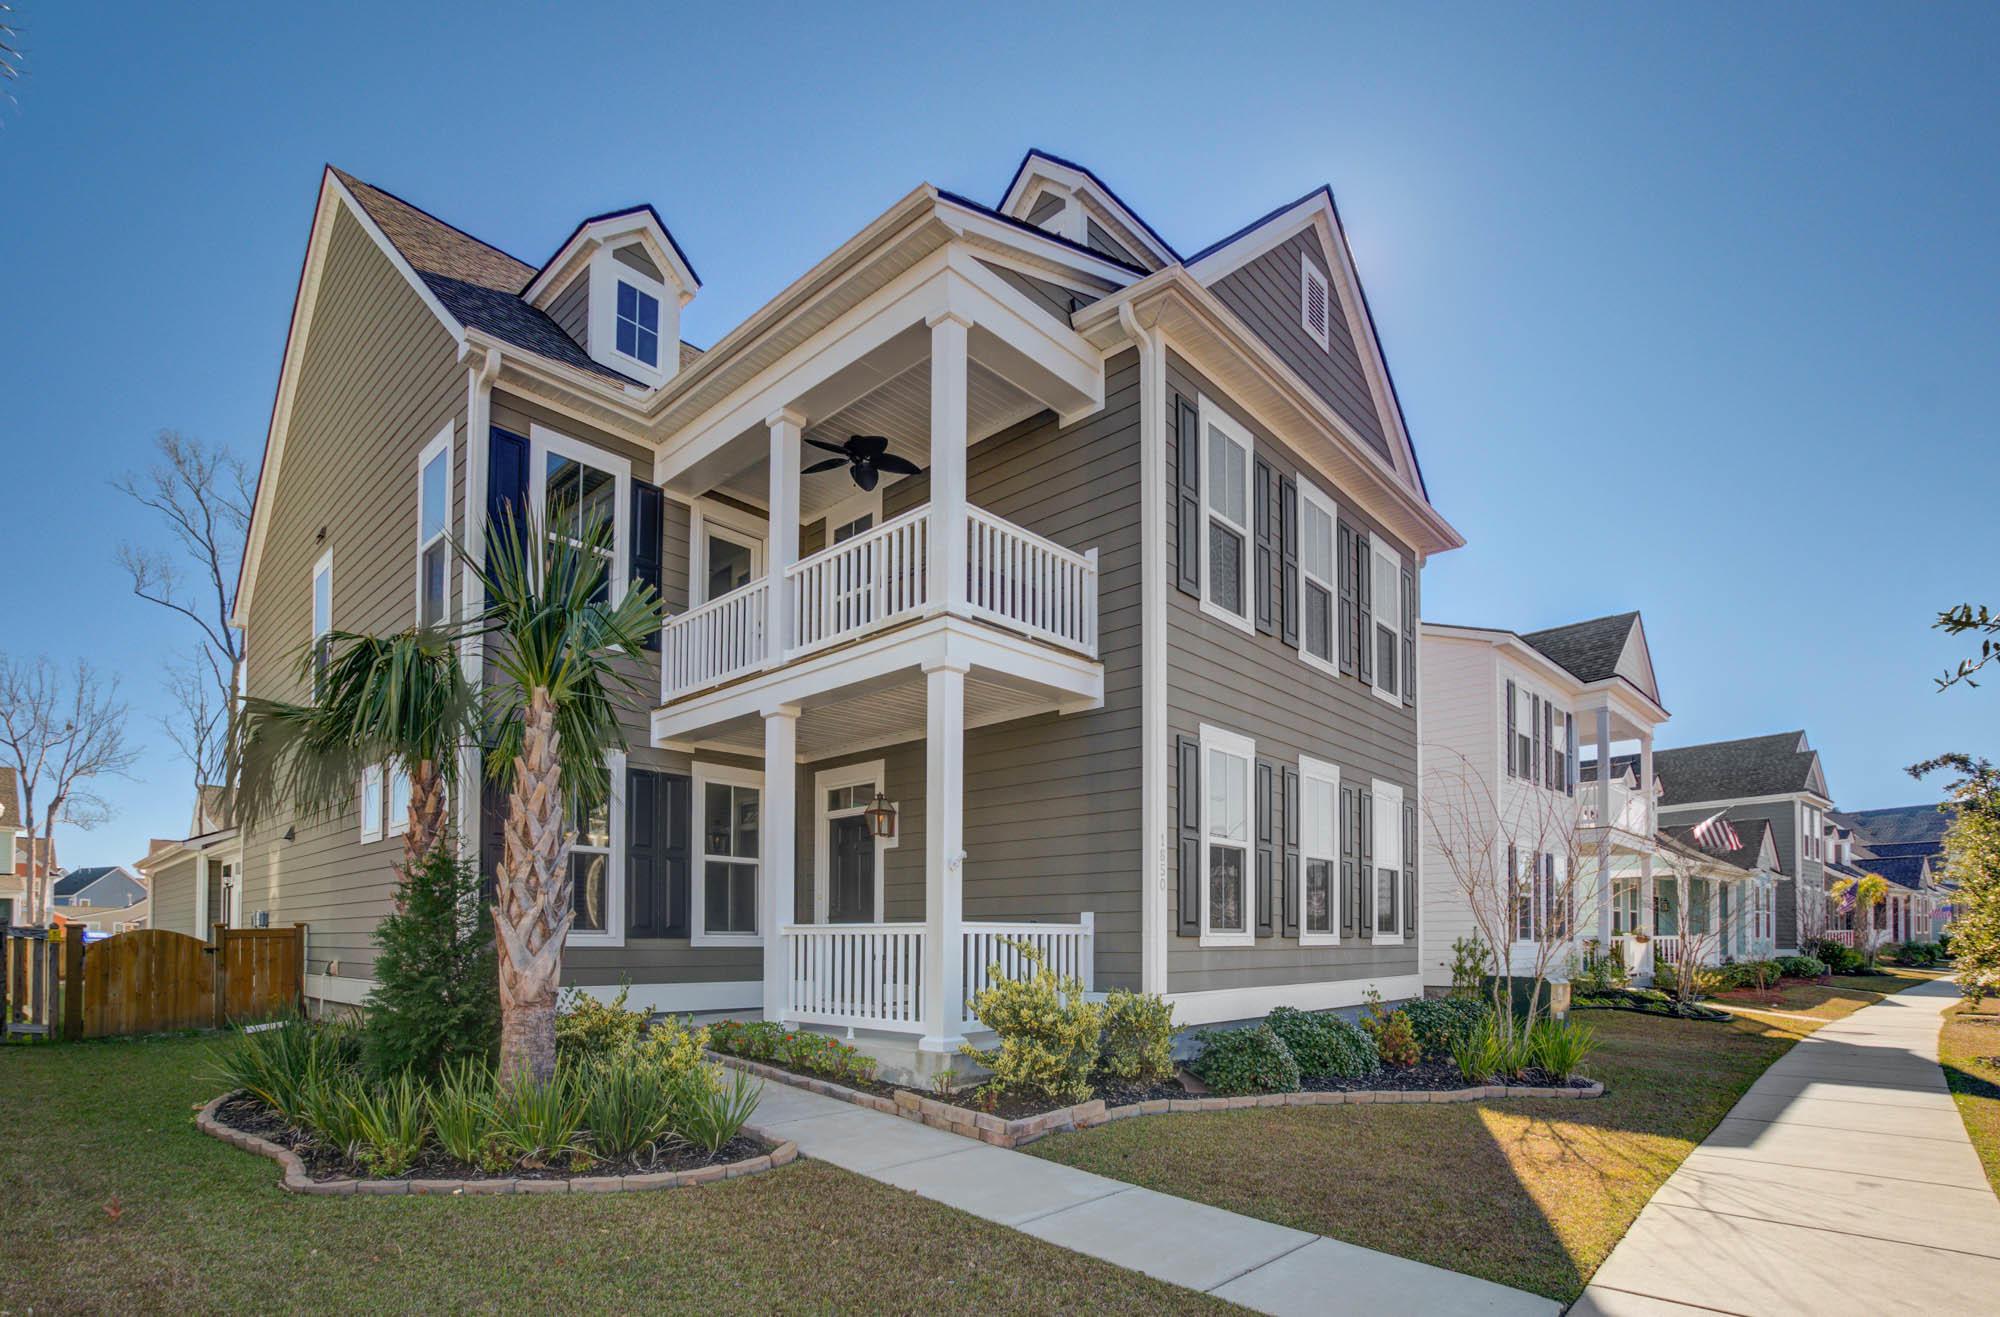 Carolina Bay Homes For Sale - 1850 Grovehurst, Charleston, SC - 8